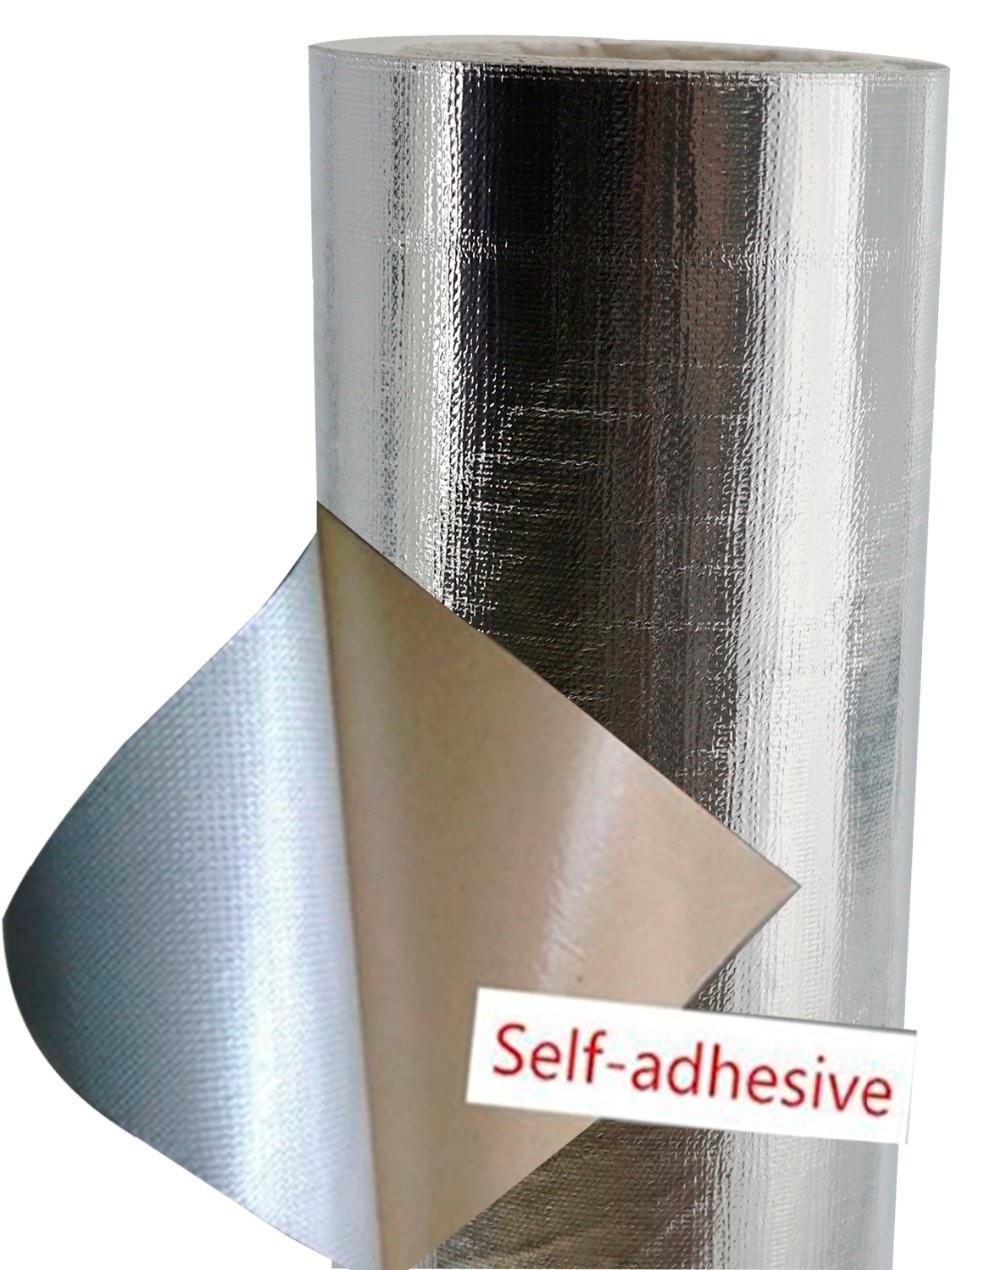 Fiberglass Cloth Insulation Self adhesive Aluminum Fiberglass Heat Shield Protection insulation exhaust